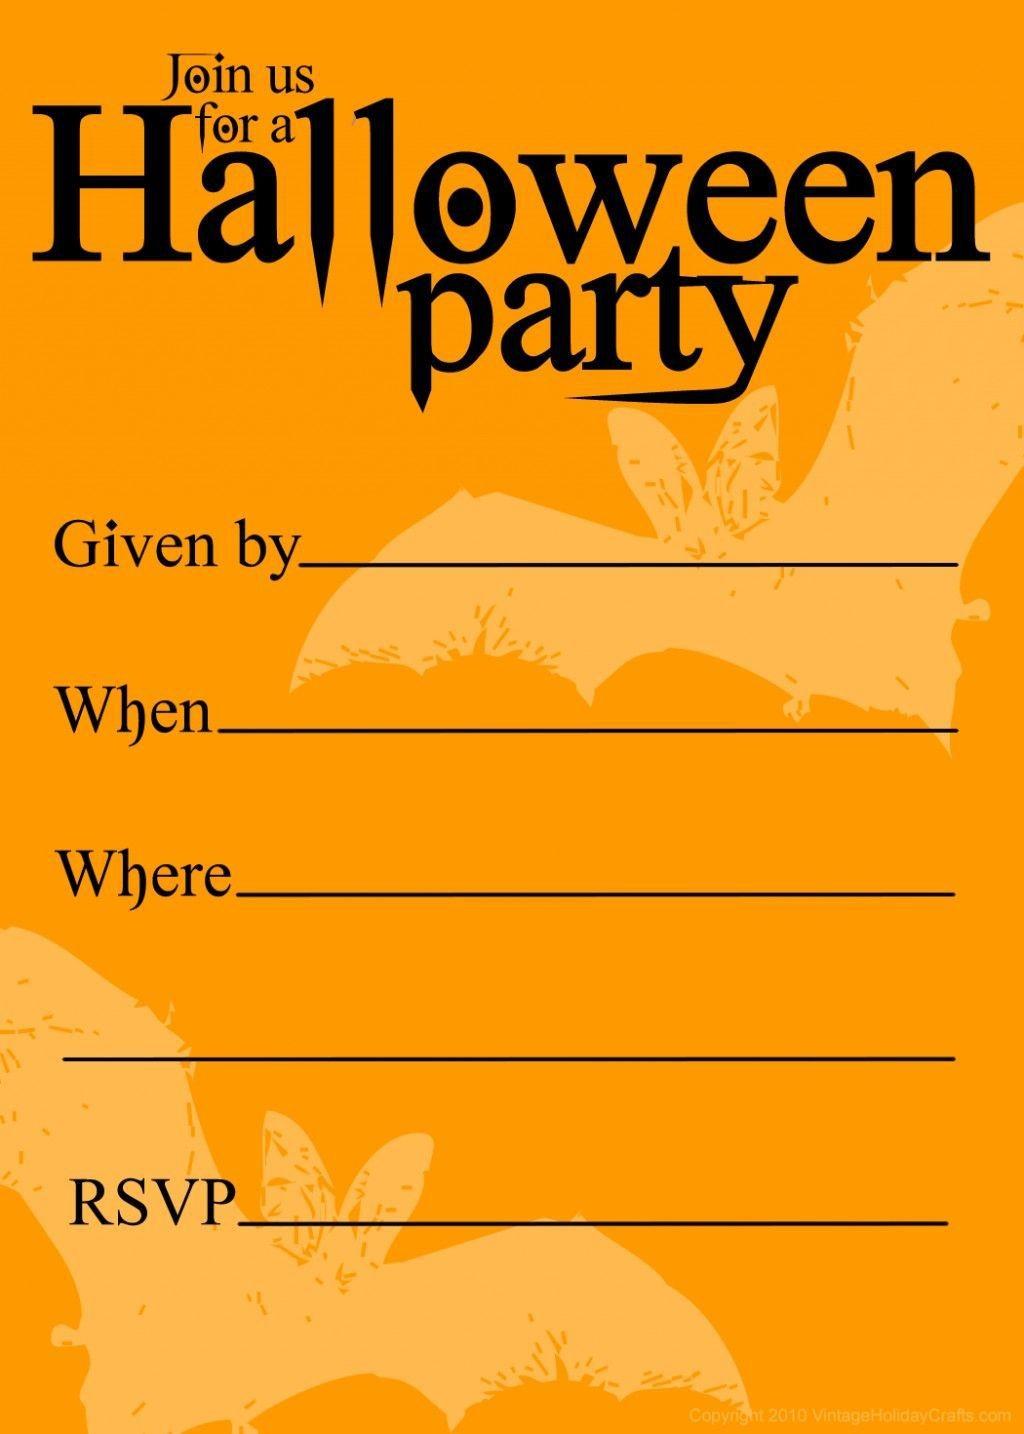 003 Surprising Halloween Party Invitation Template Picture  Microsoft Block OctoberLarge